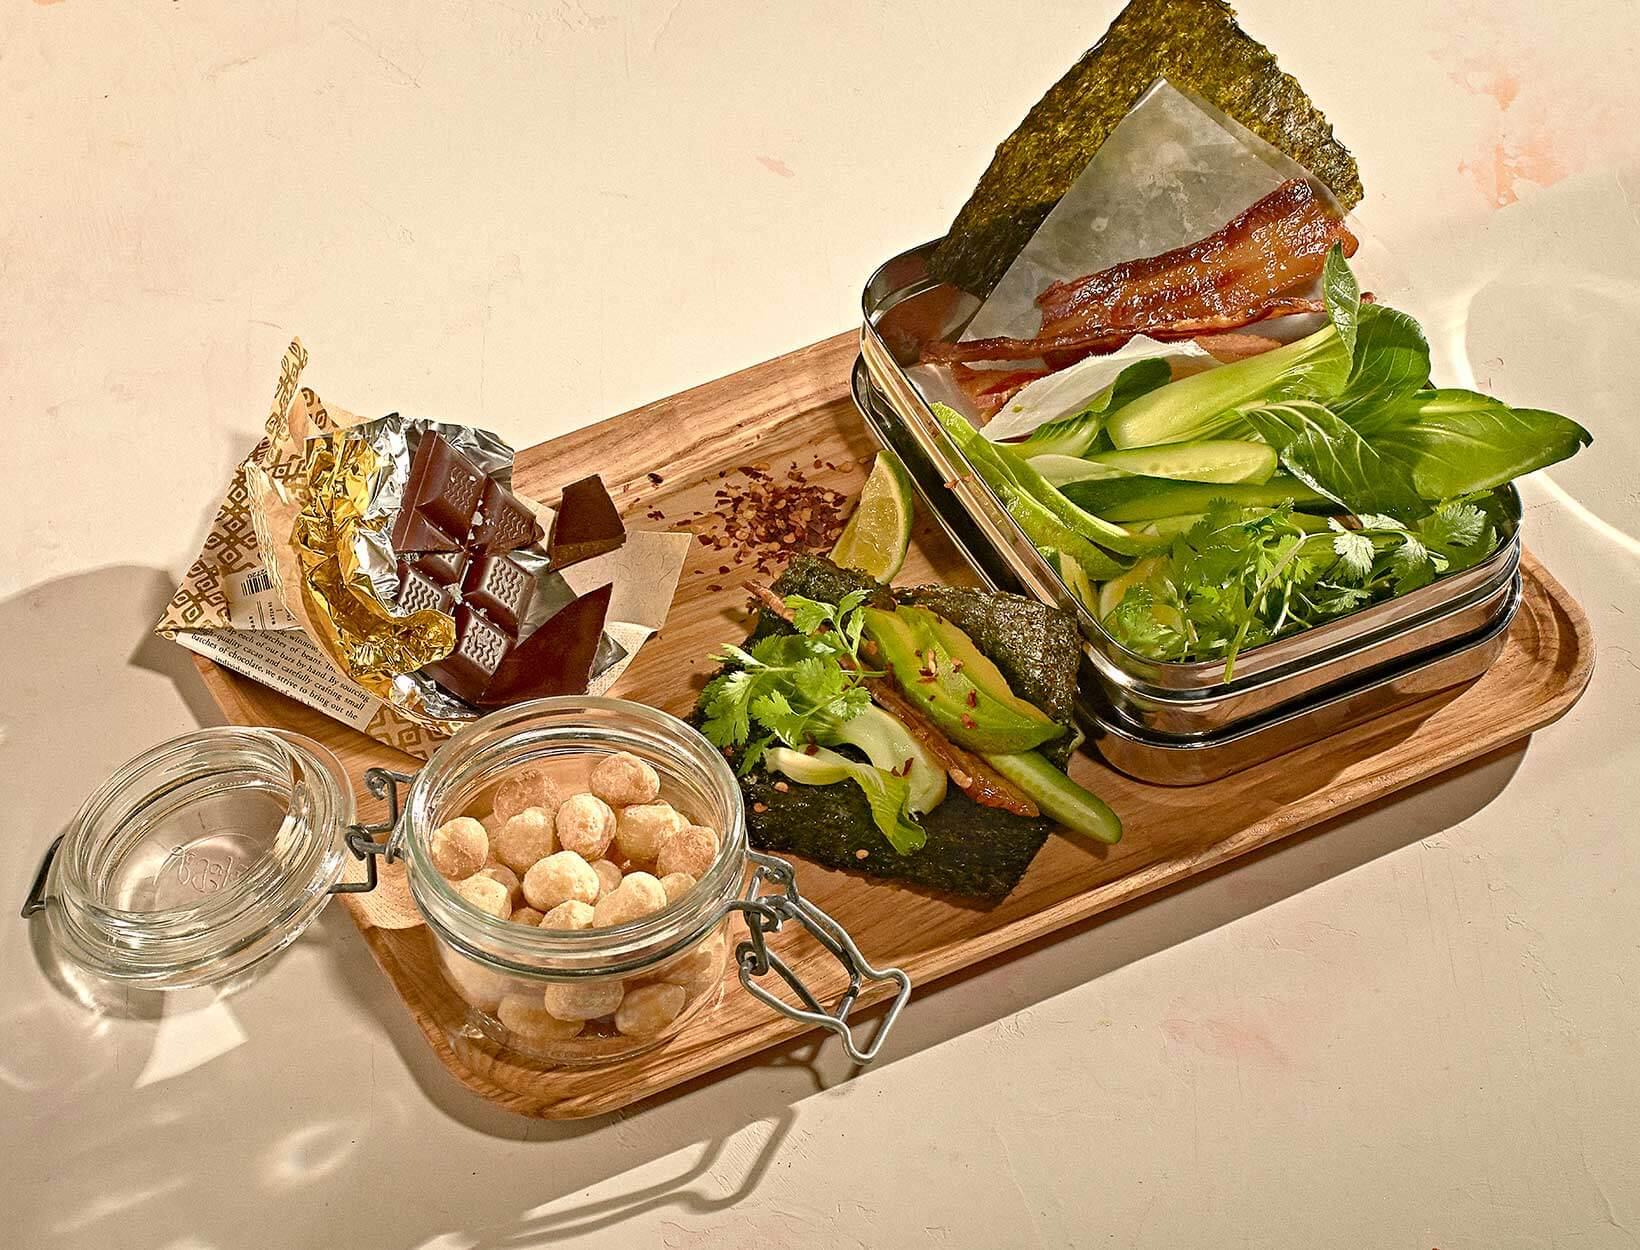 Plane Food Kit